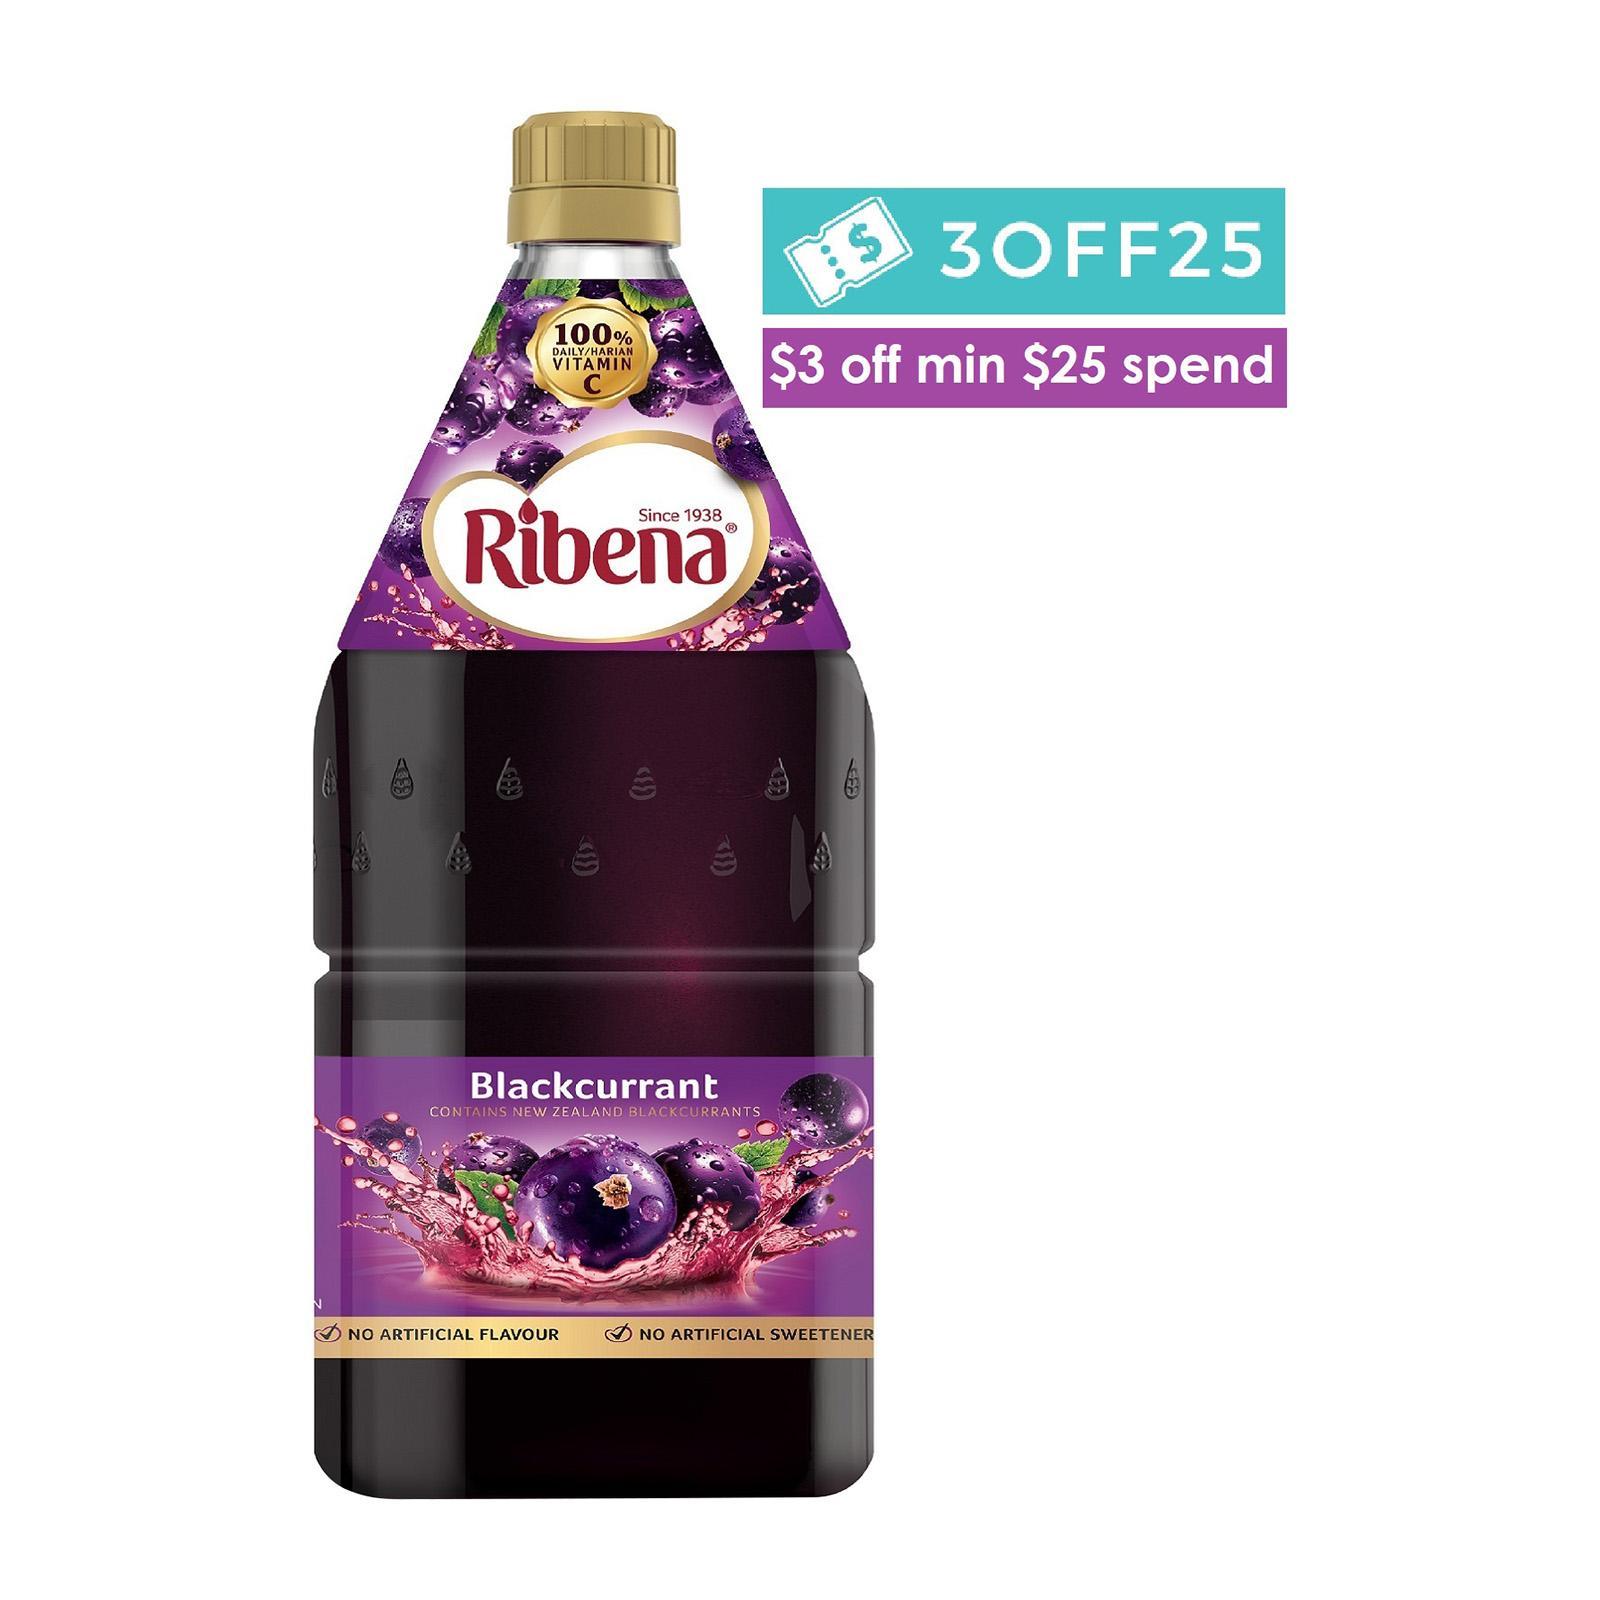 RIBENA Blackcurrant Juice Cordial 2L